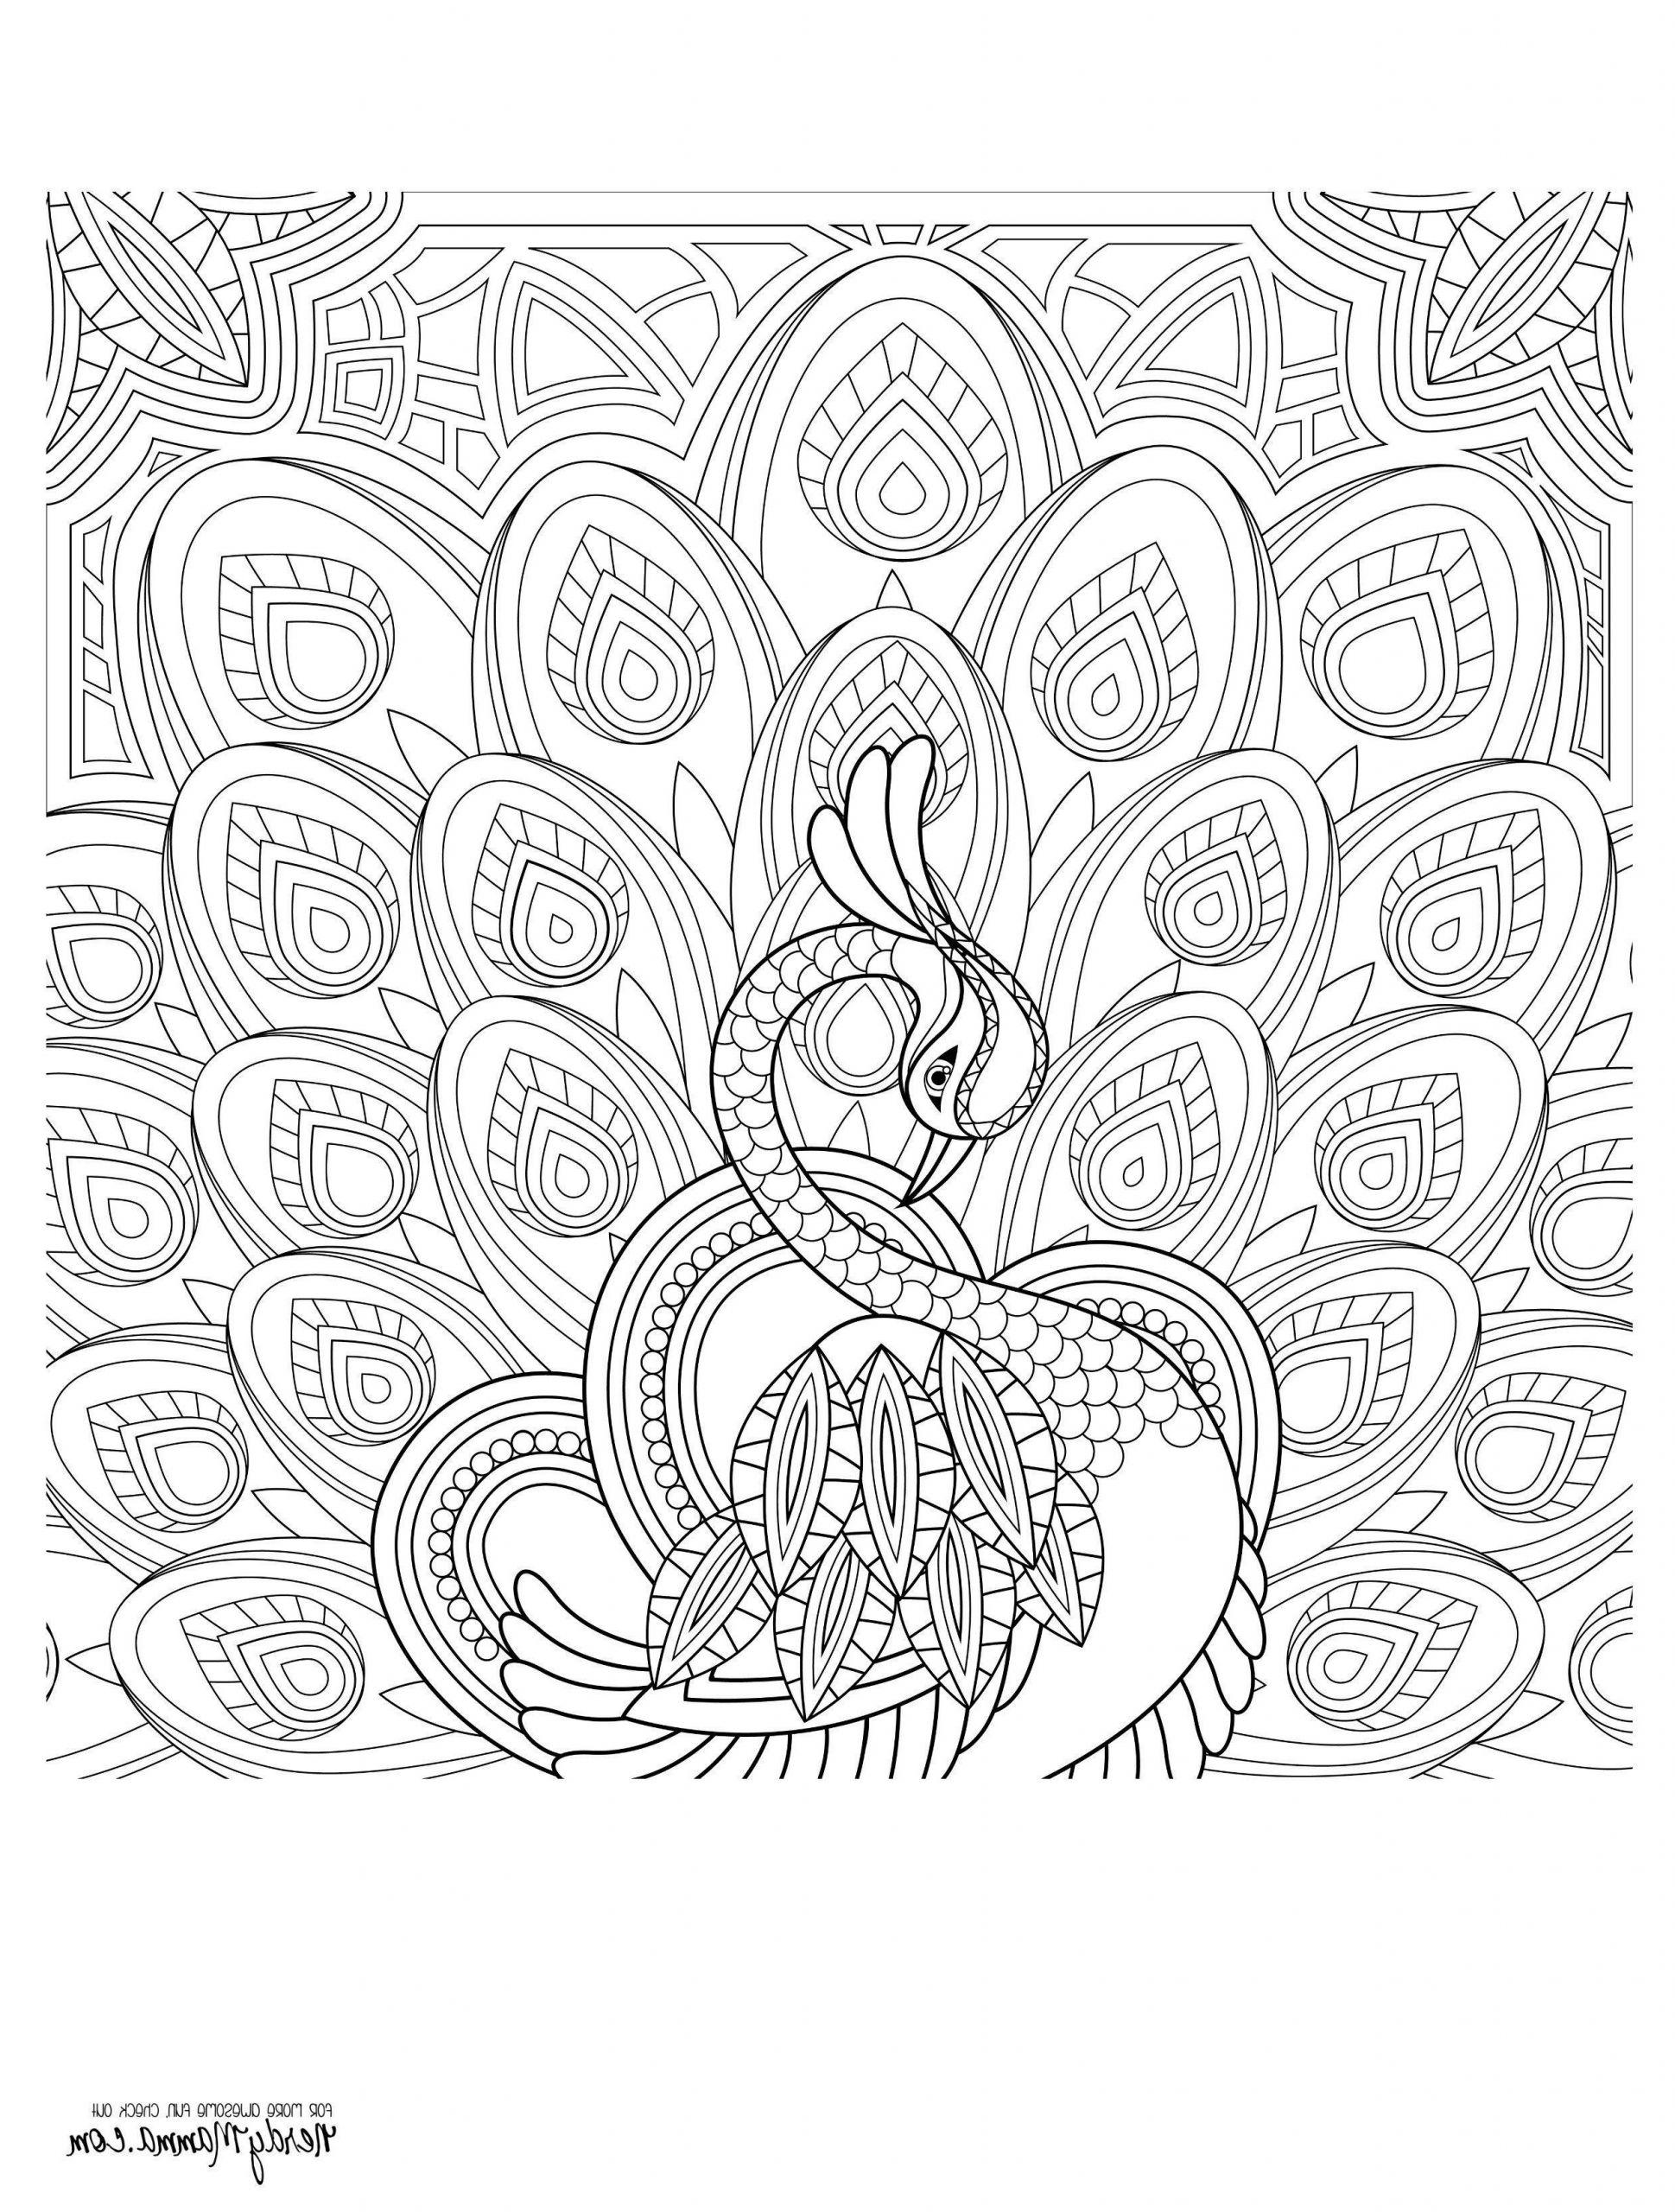 Ausmalbilder Garten Elegant 23 Cool Collection House Coloring Design